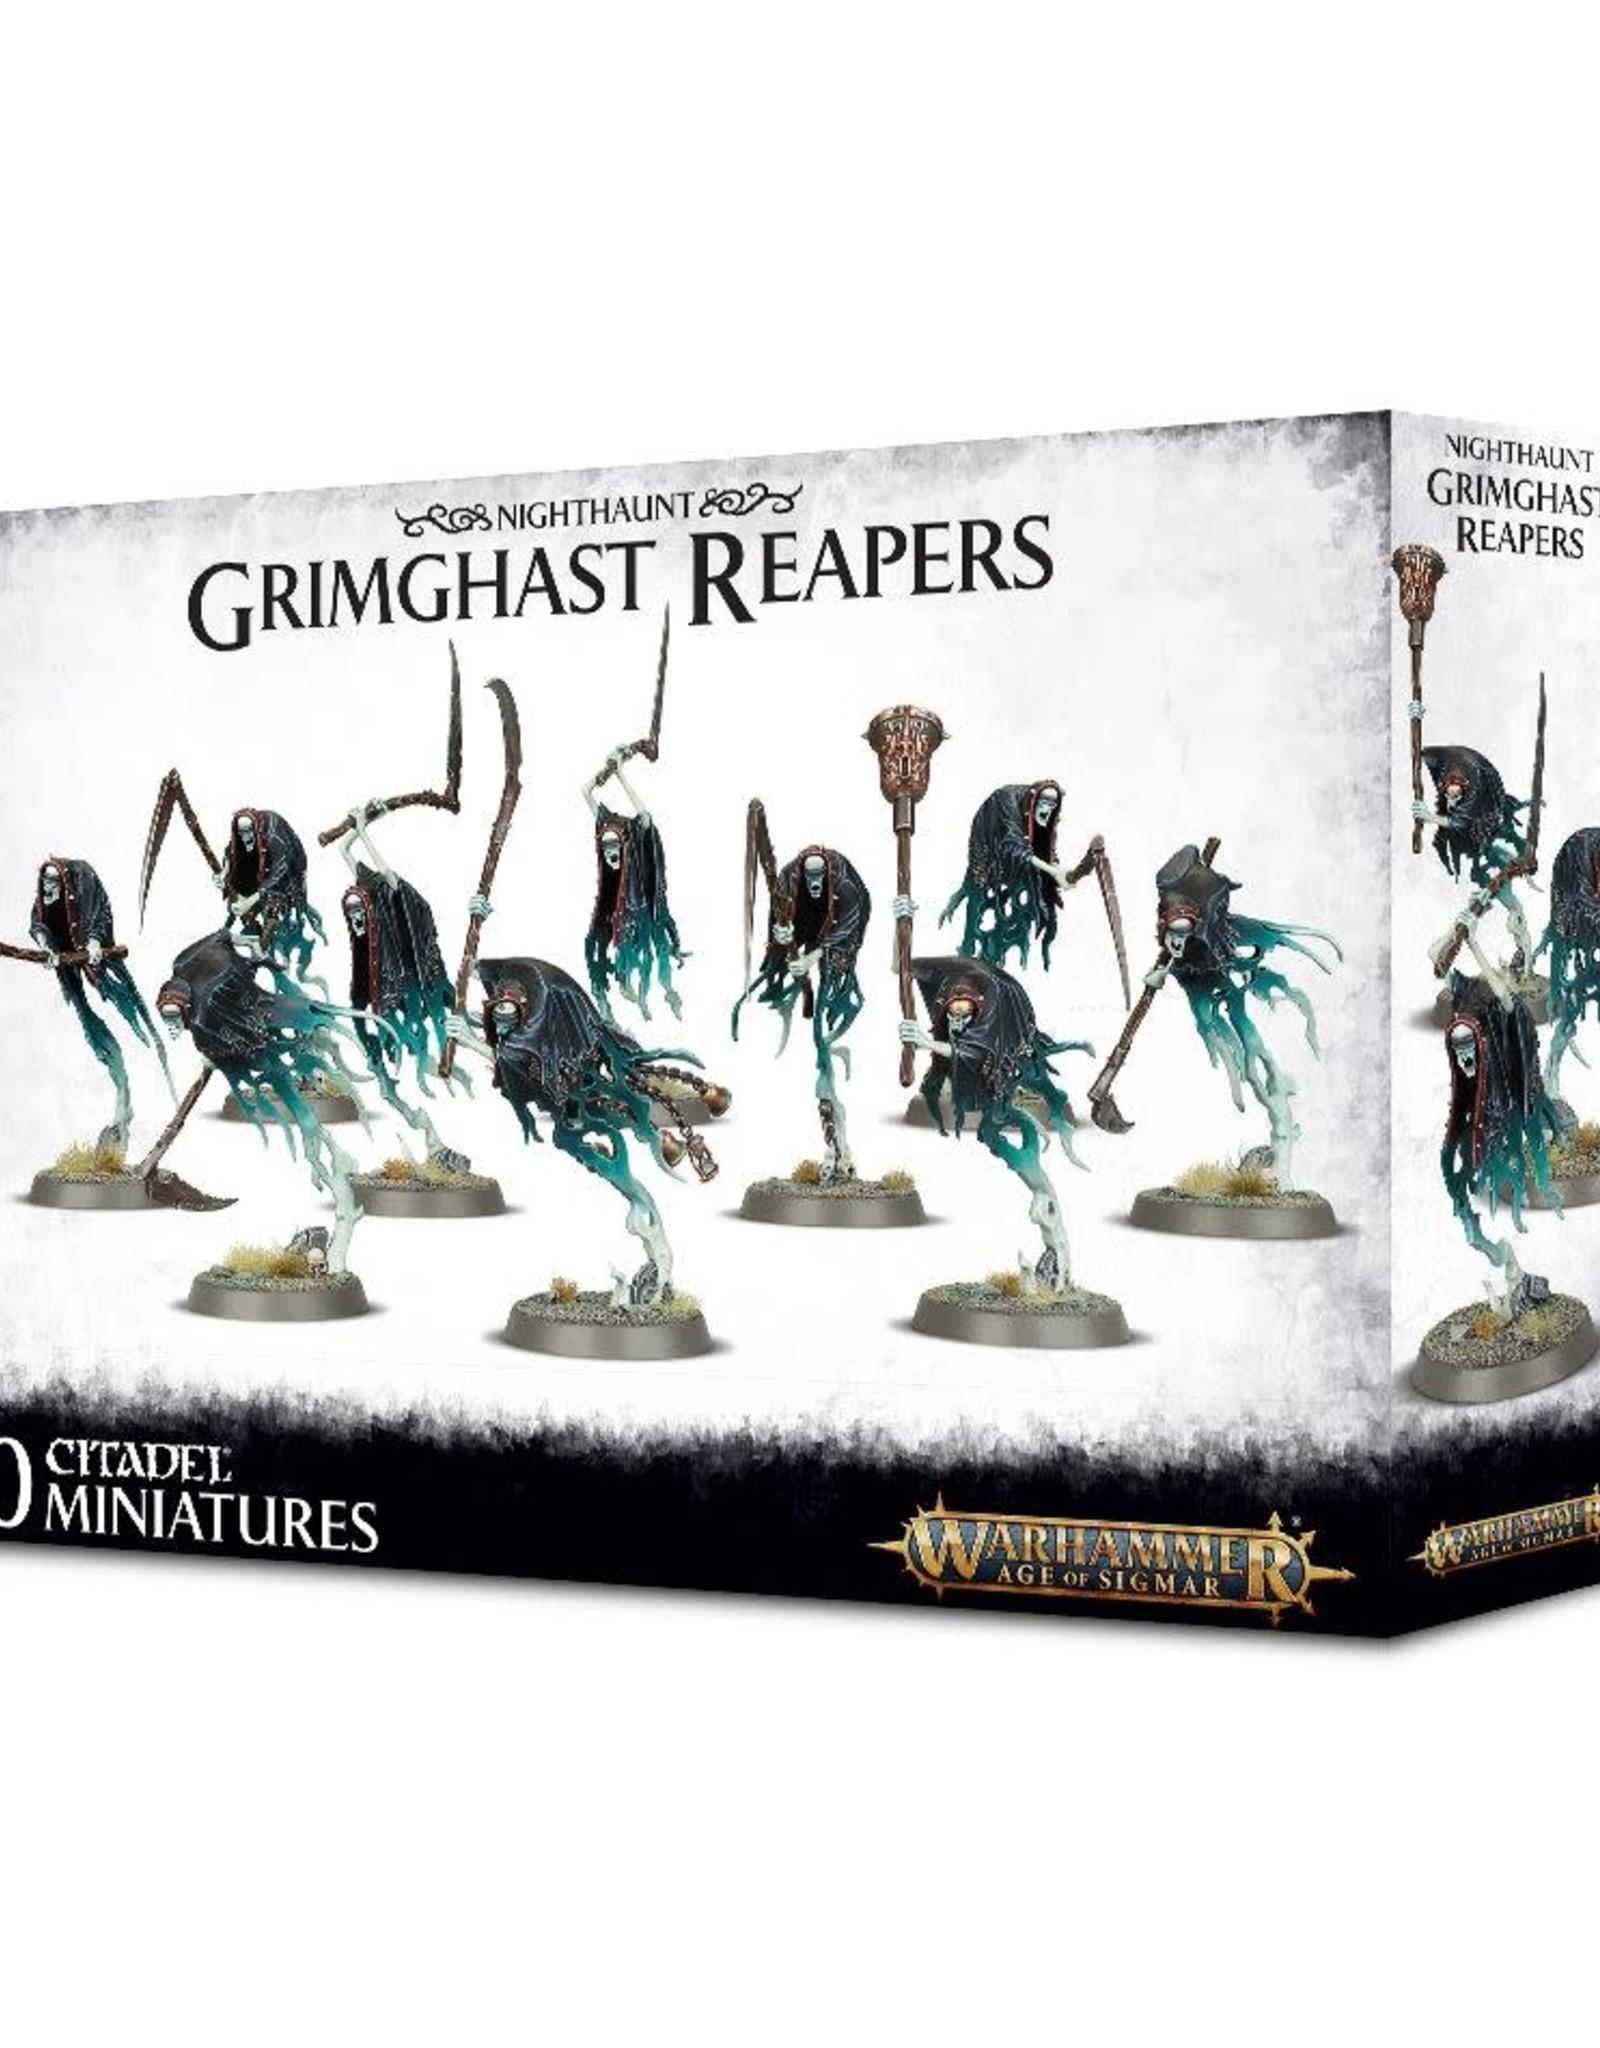 Age of Sigmar Nighthaunt Grimghast Reapers